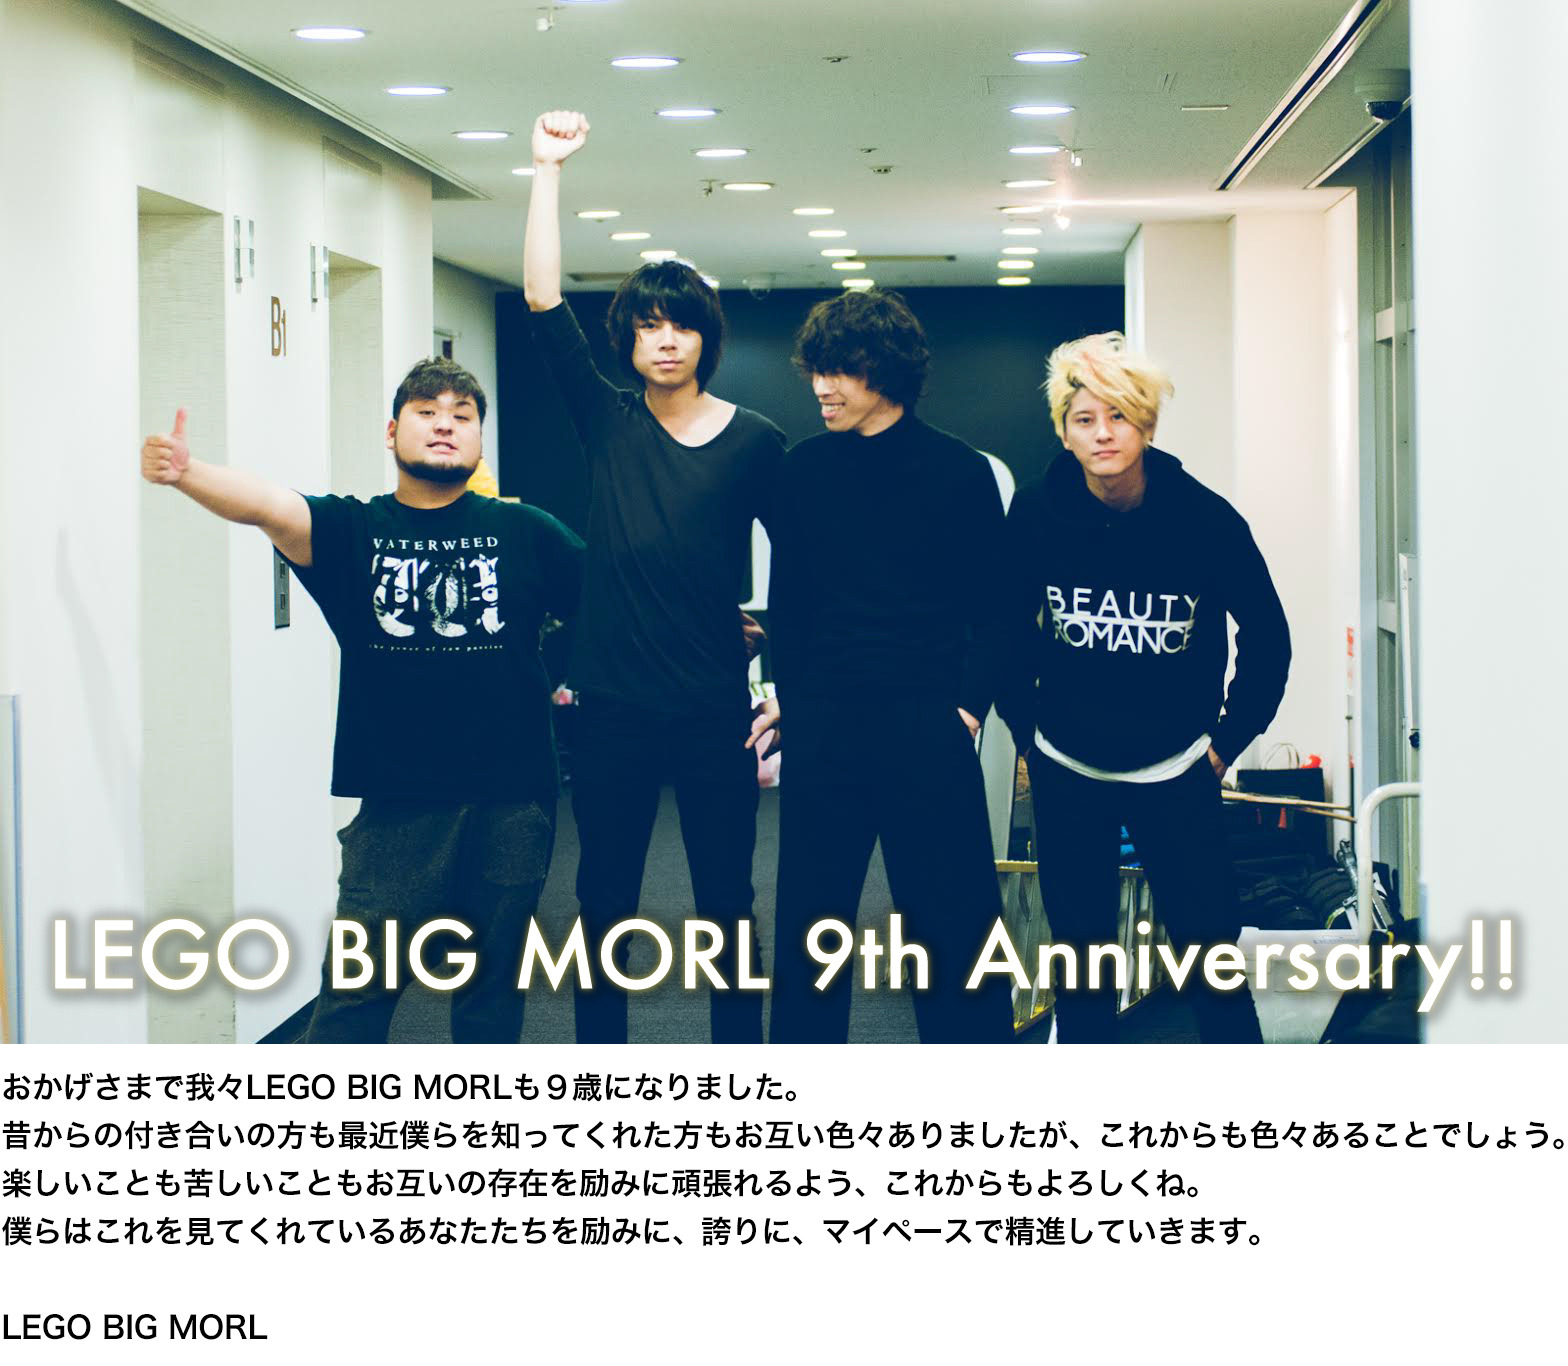 20150327_9th_anniversary_a